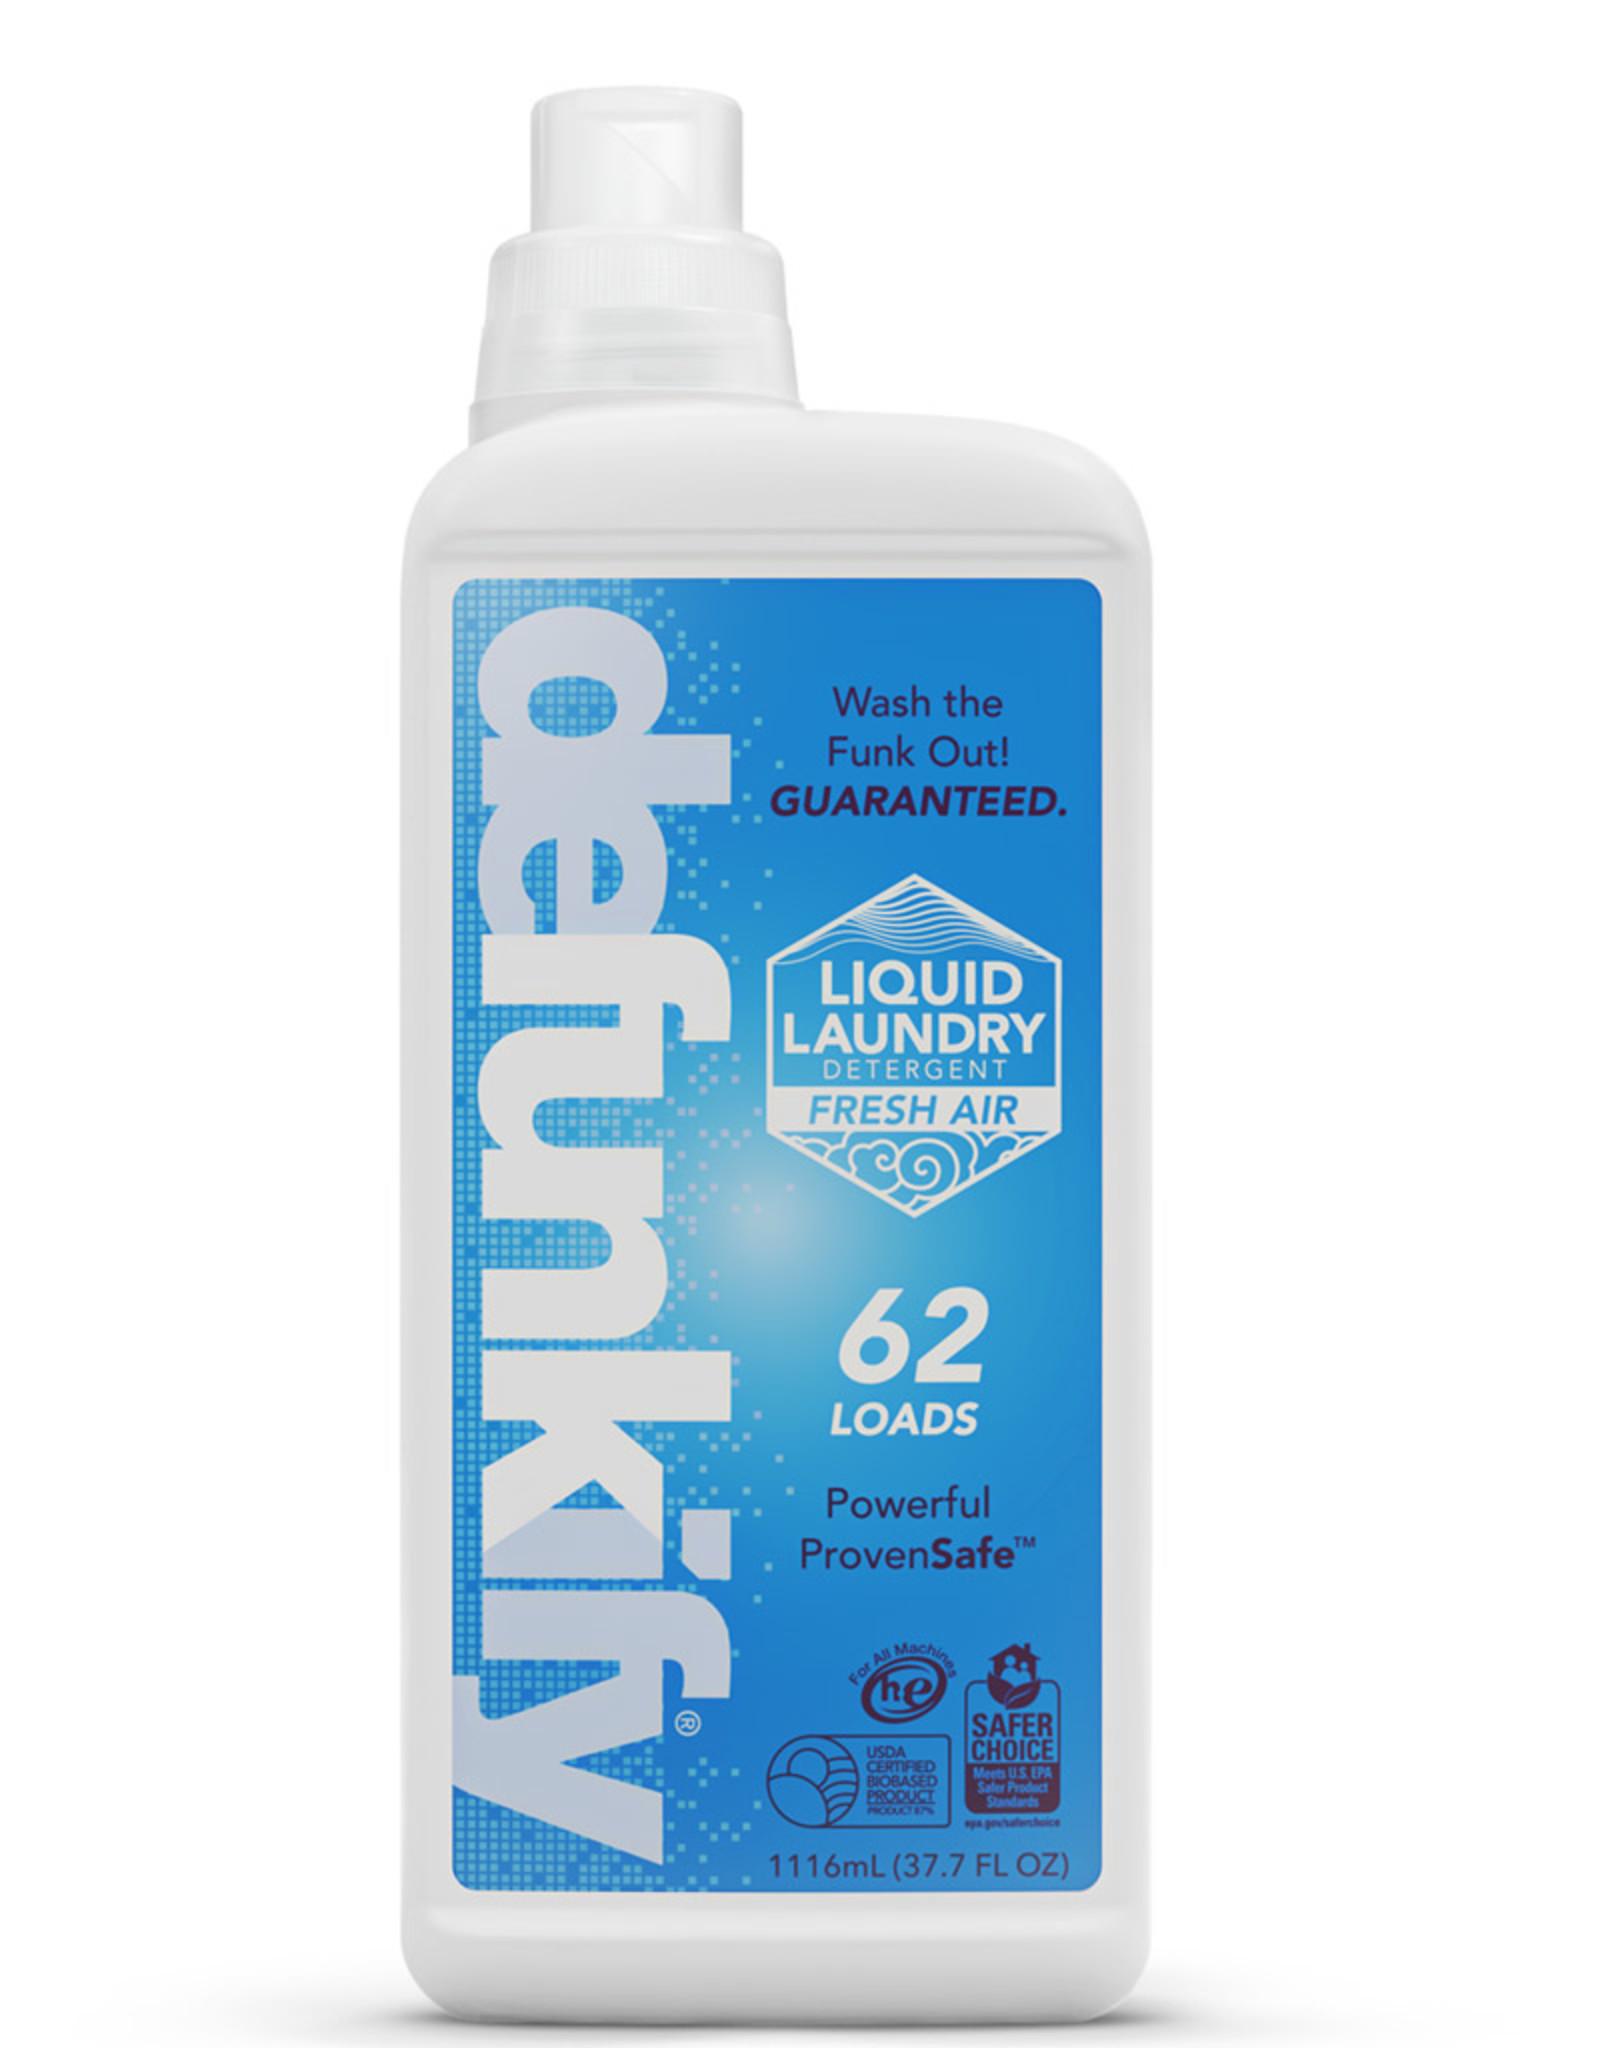 DEFUNKIT Liquid Laundry Detergent (62 LOADS)